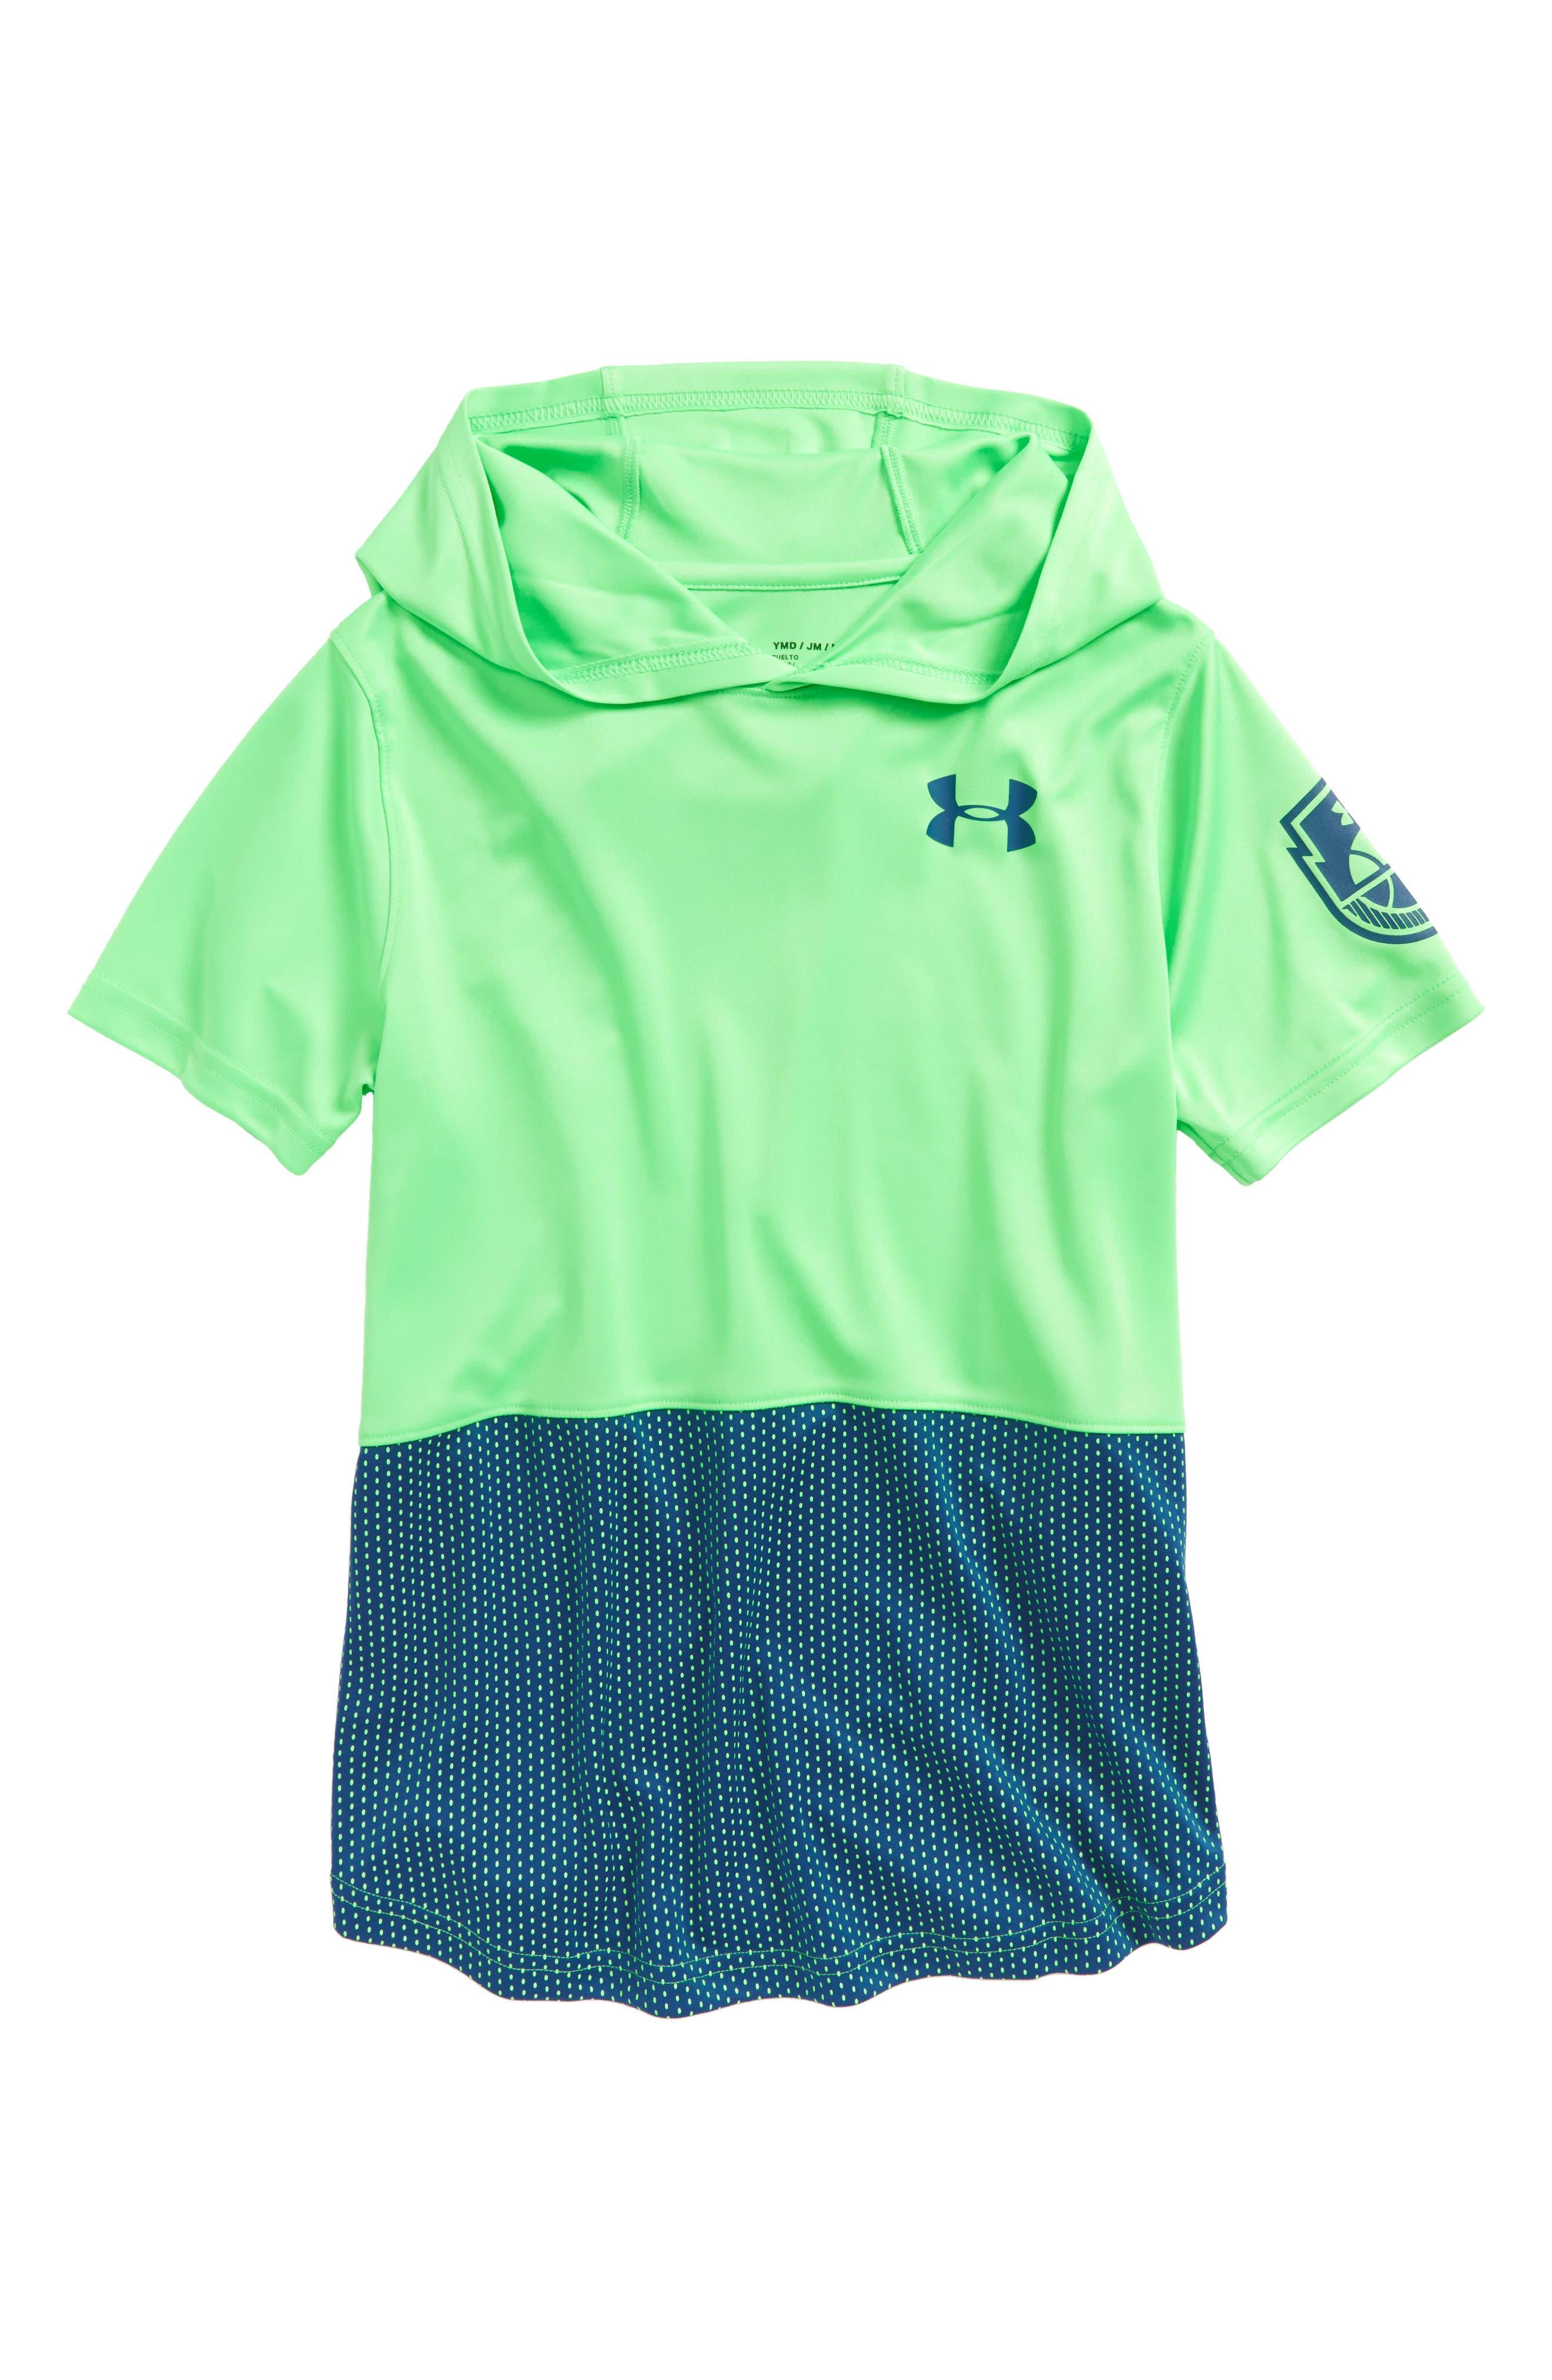 Baseline HeatGear<sup>®</sup> Hooded T-Shirt,                             Main thumbnail 1, color,                             Arena Green/ Moroccan Blue